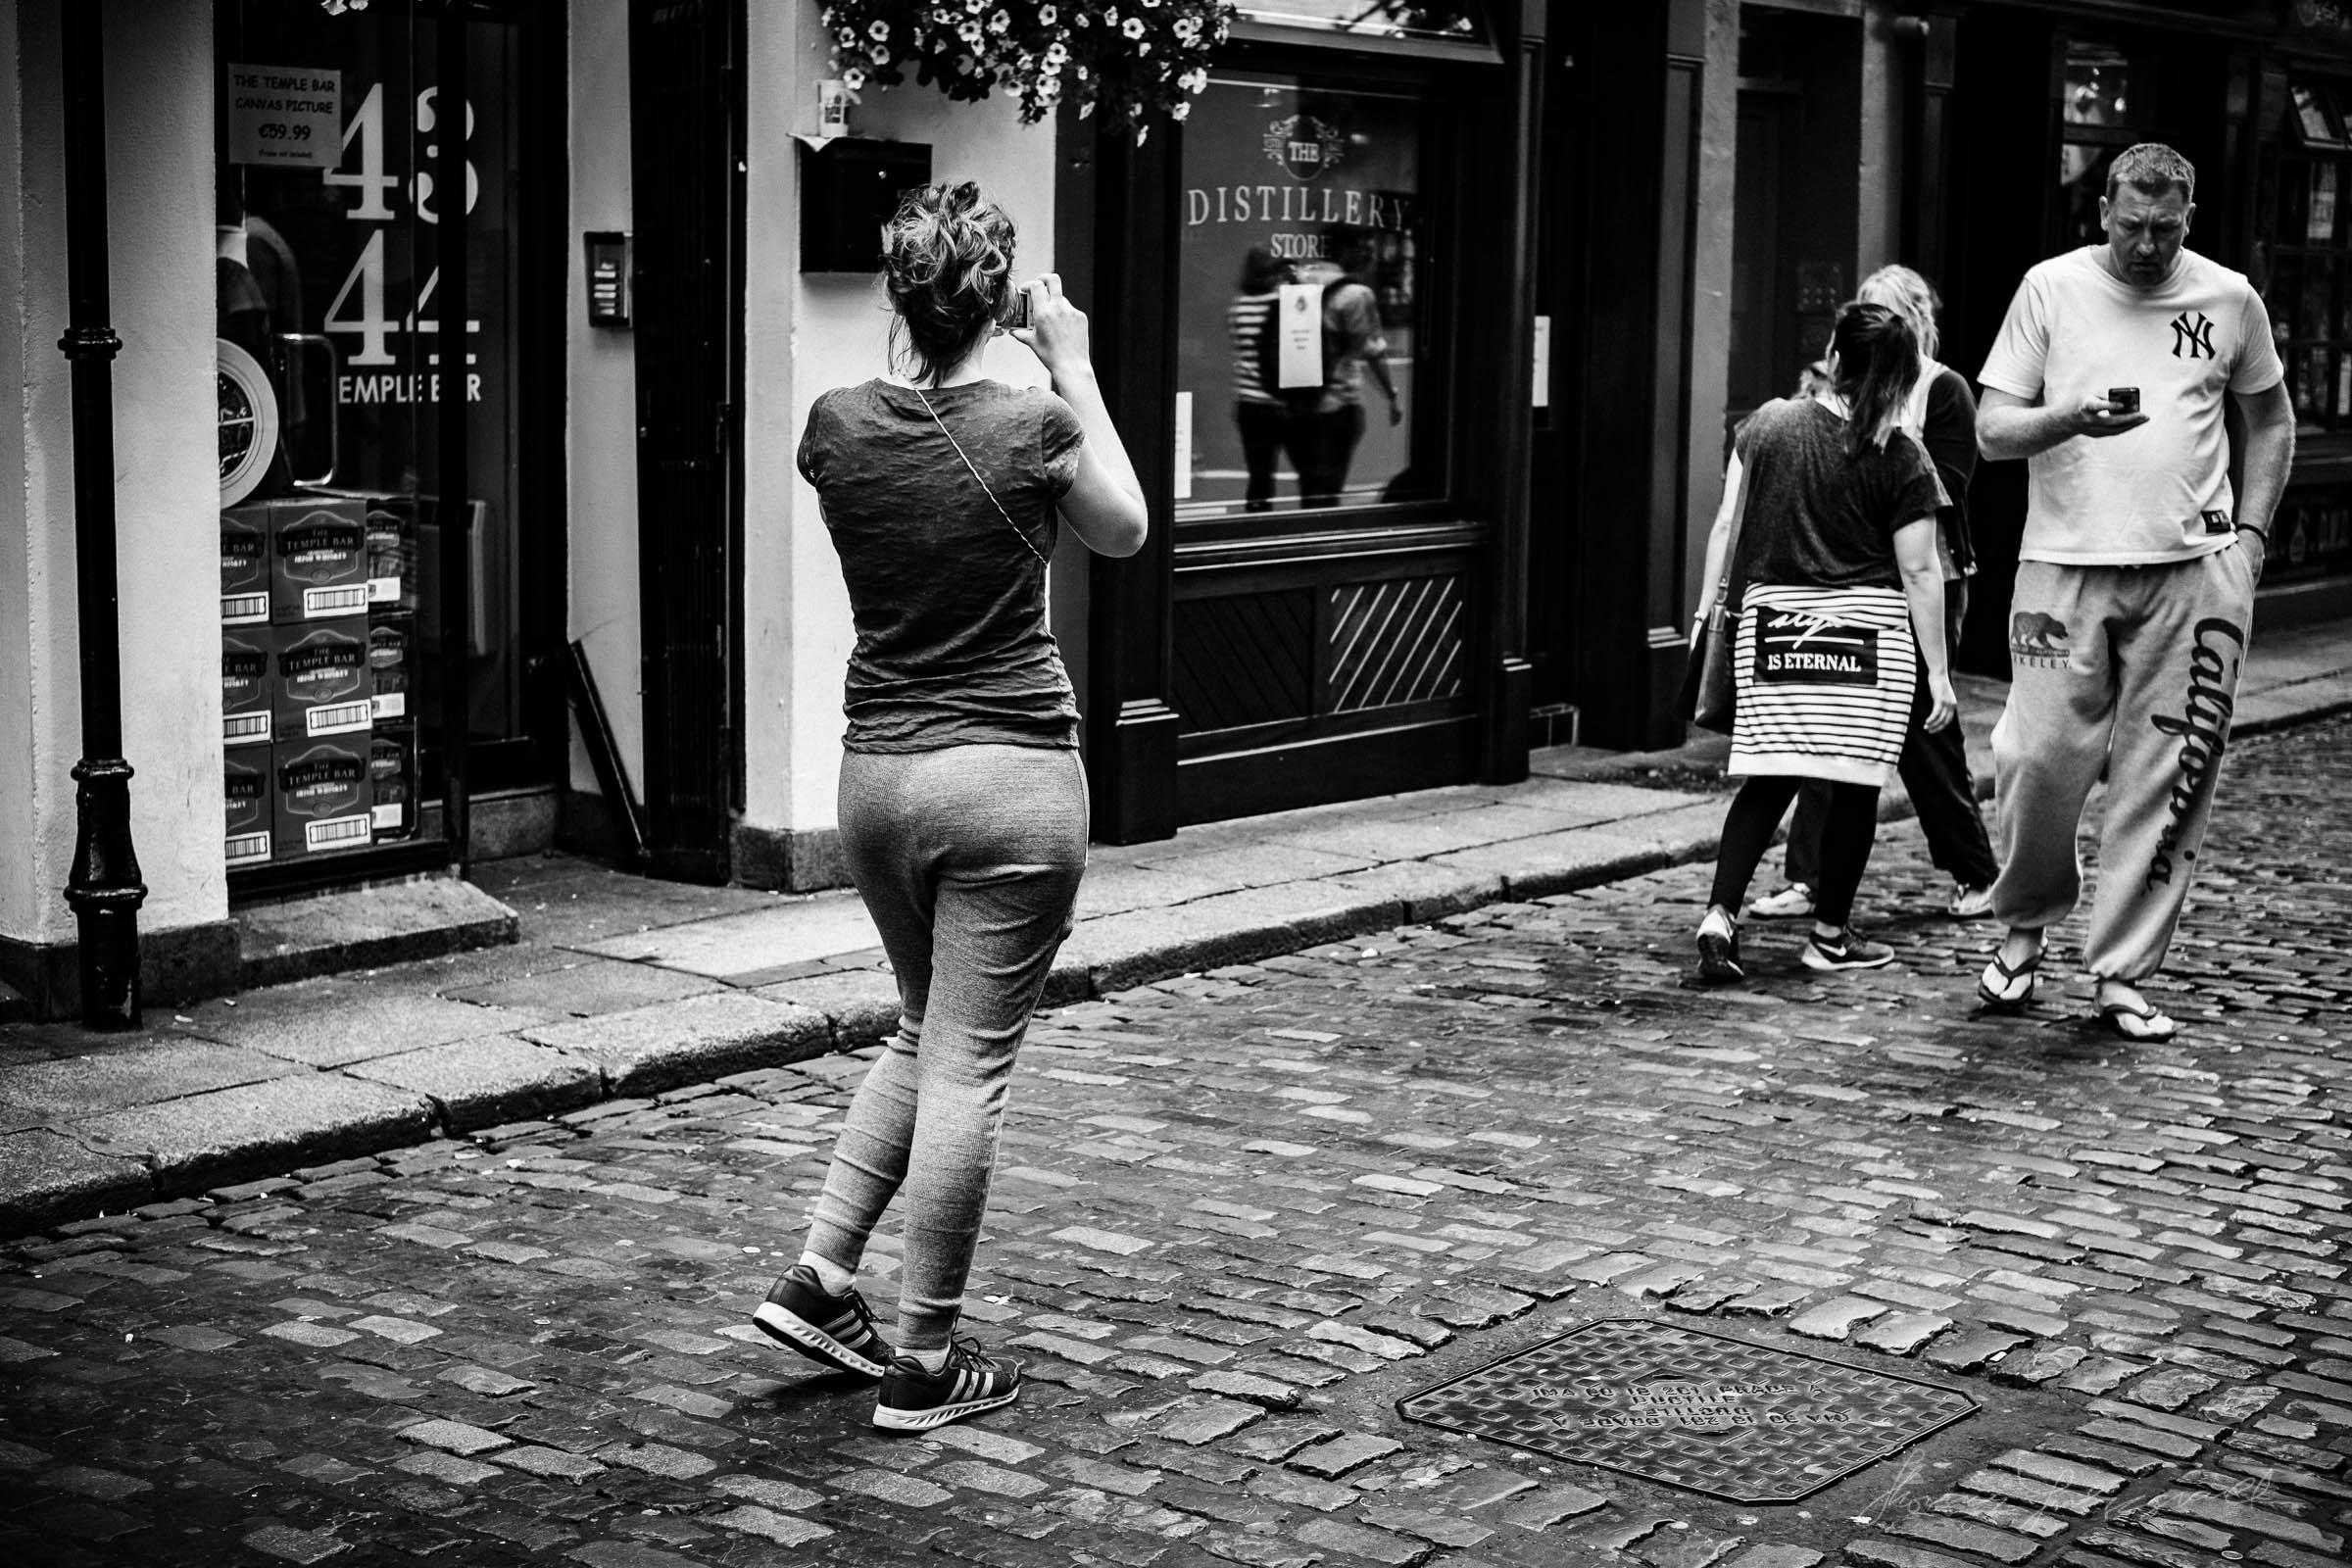 Tourist taking a Photo in Dublin's Temple Bar